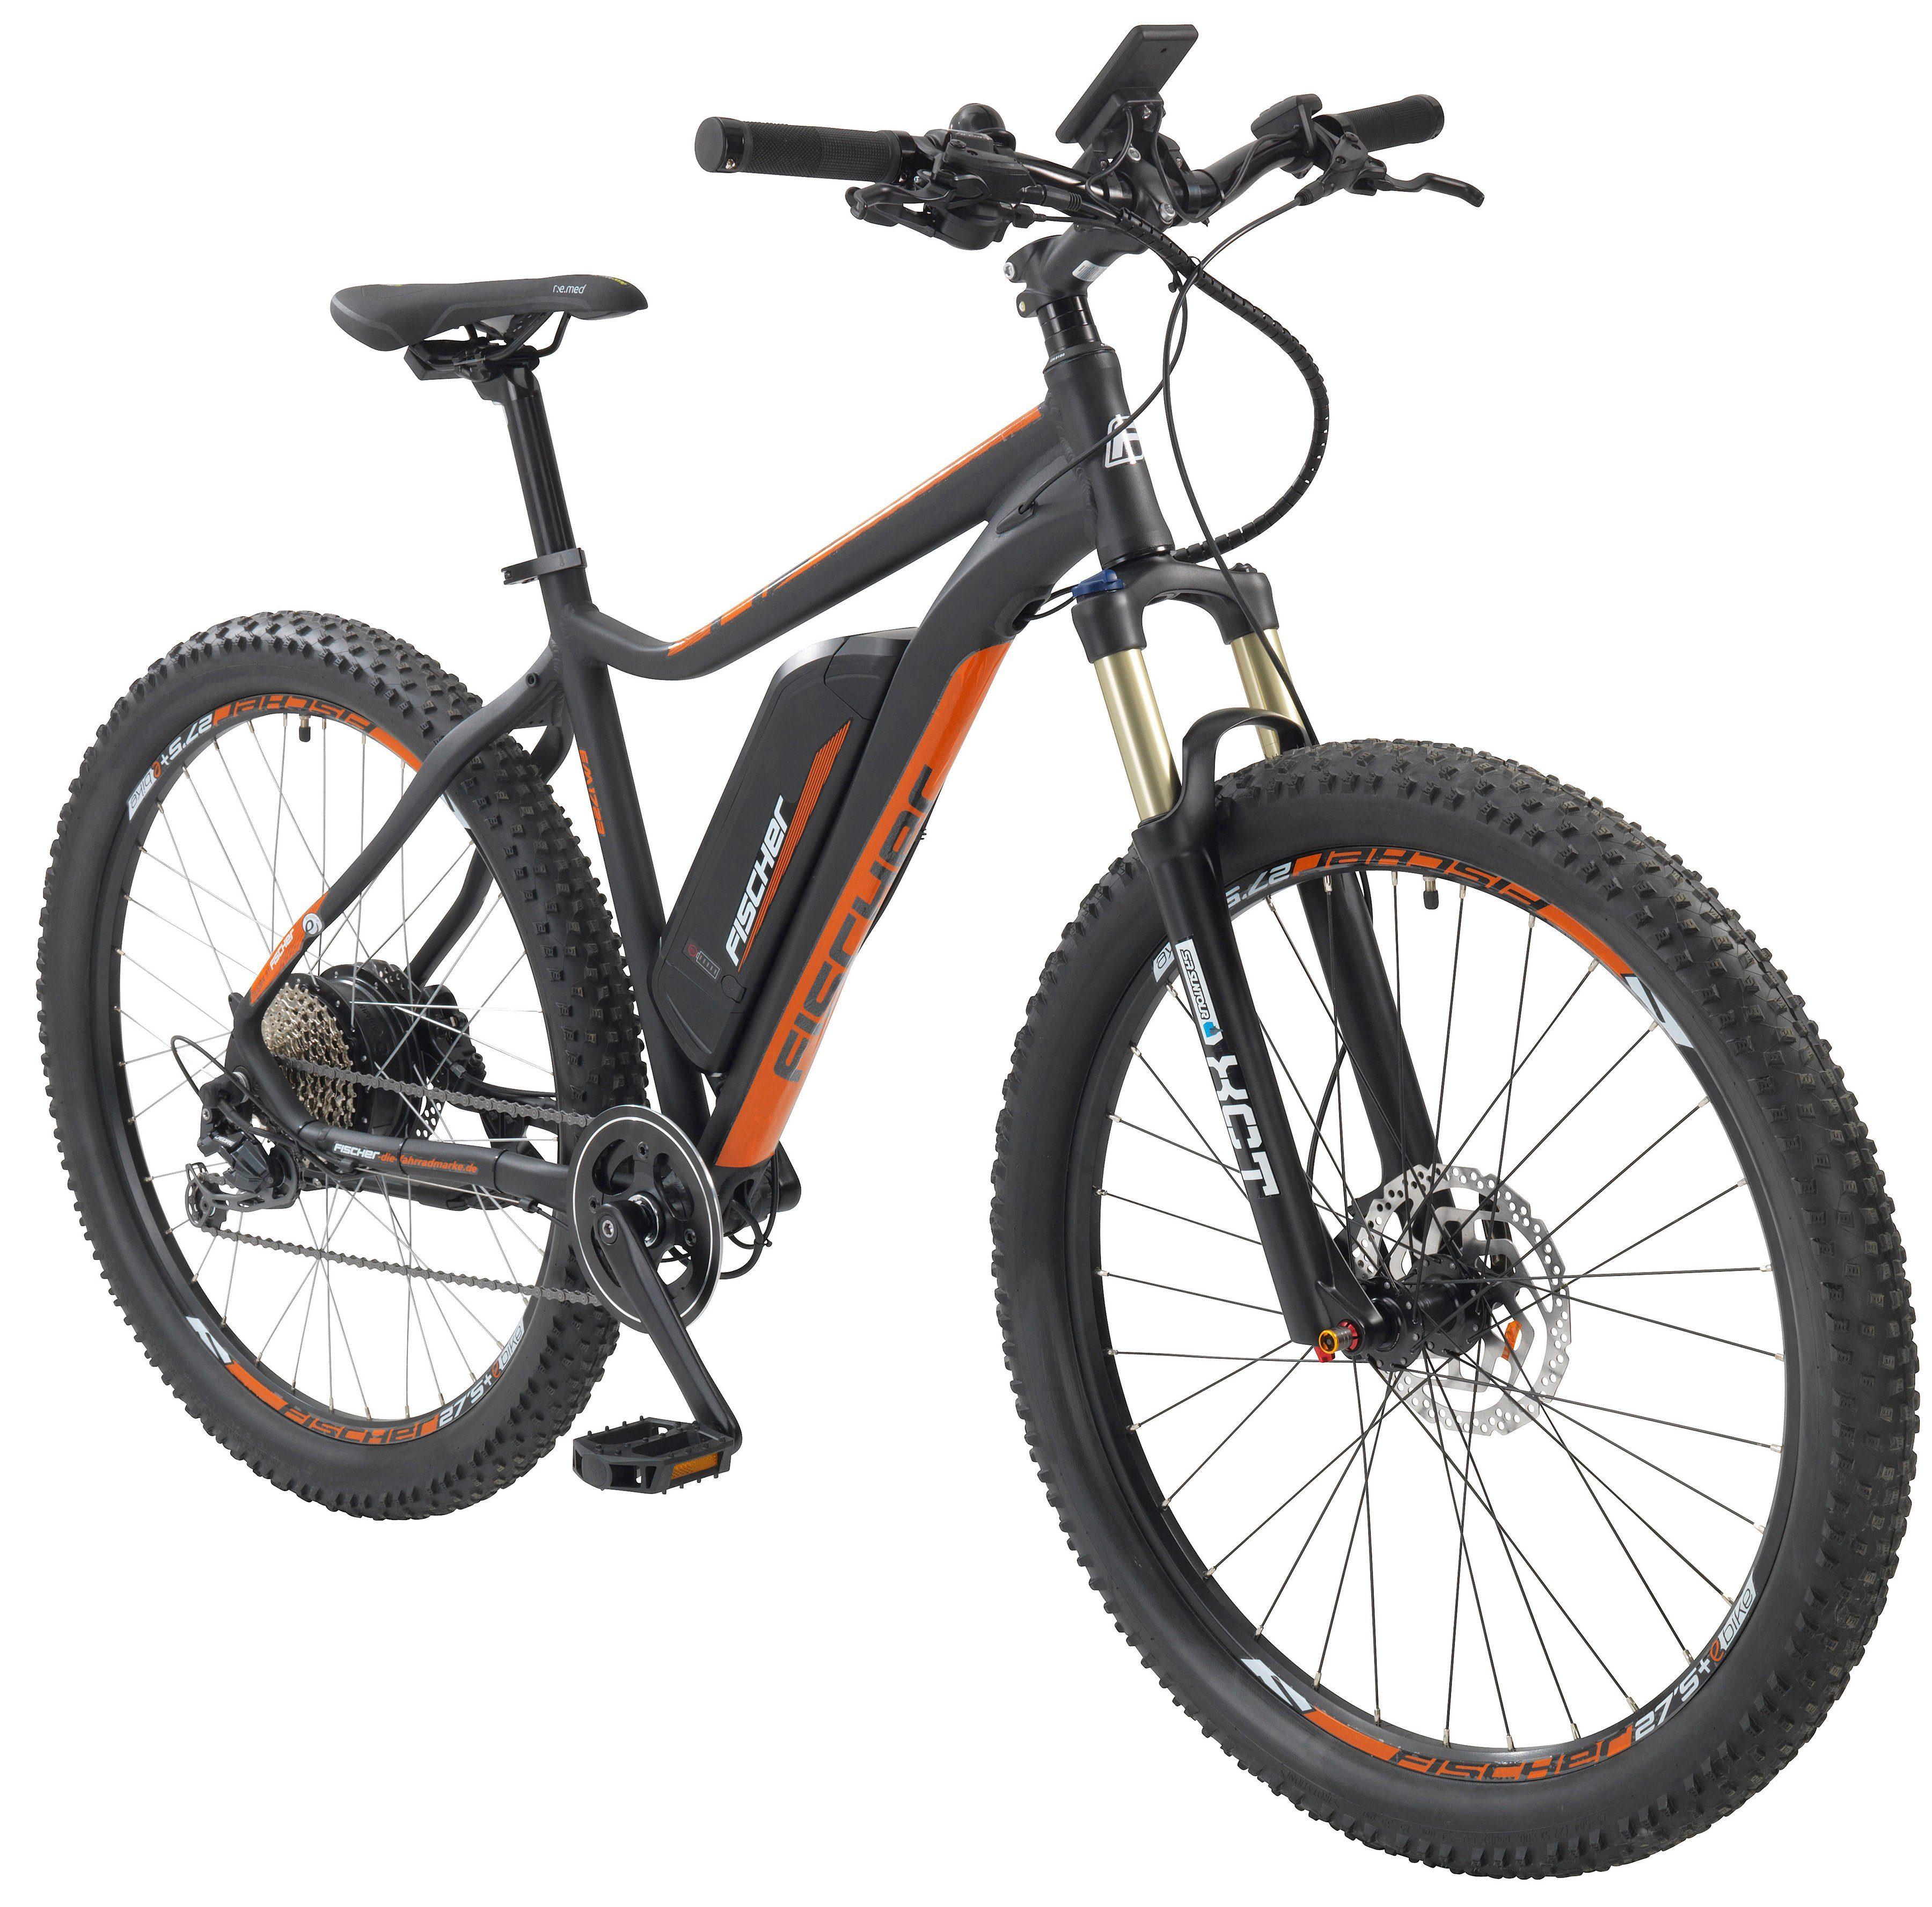 FISCHER FAHRRAEDER E-Bike Mountainbike »EM 1723-S1«, 27,5+ Zoll, 9 Gang, Heckmotor, 557 Wh